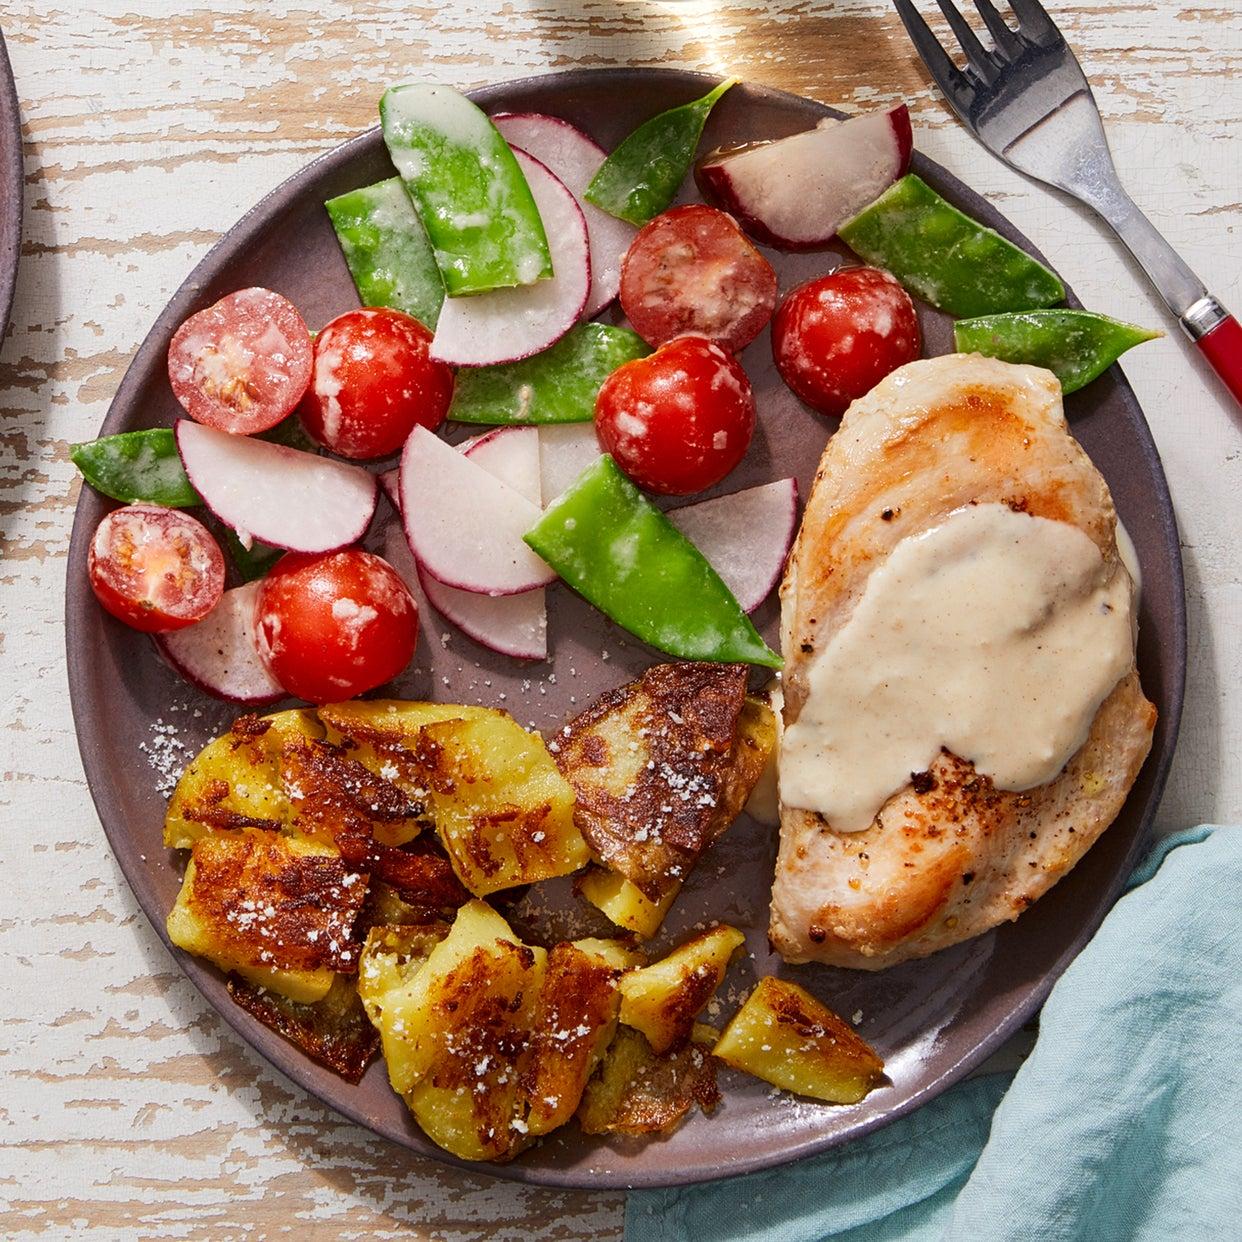 Tahini Chicken with Crispy Smashed Potatoes & Snow Pea-Tomato Salad